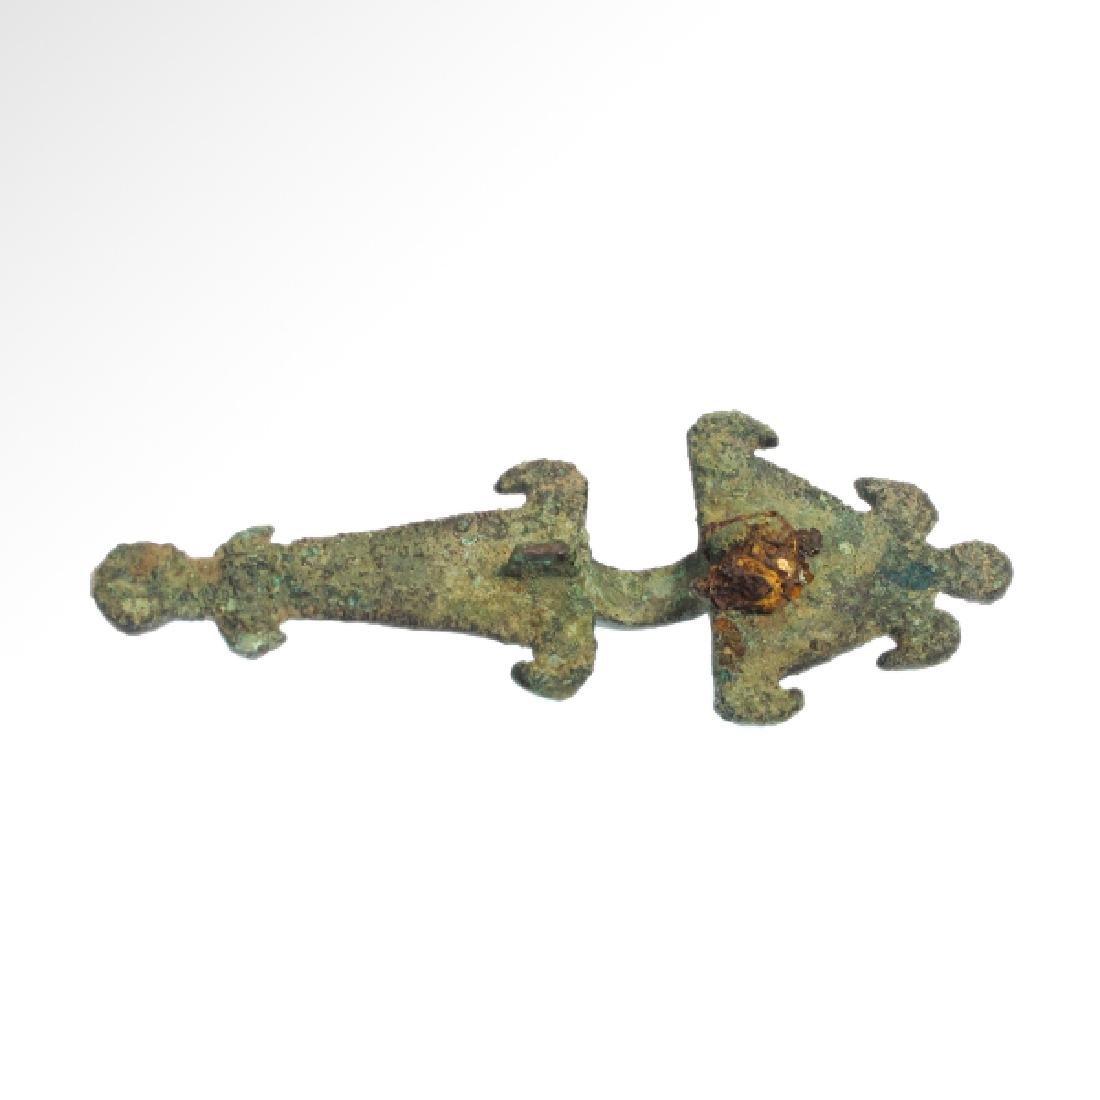 Ostrogothic/Visigothic Bronze Fibula, c. 6th Century - 5